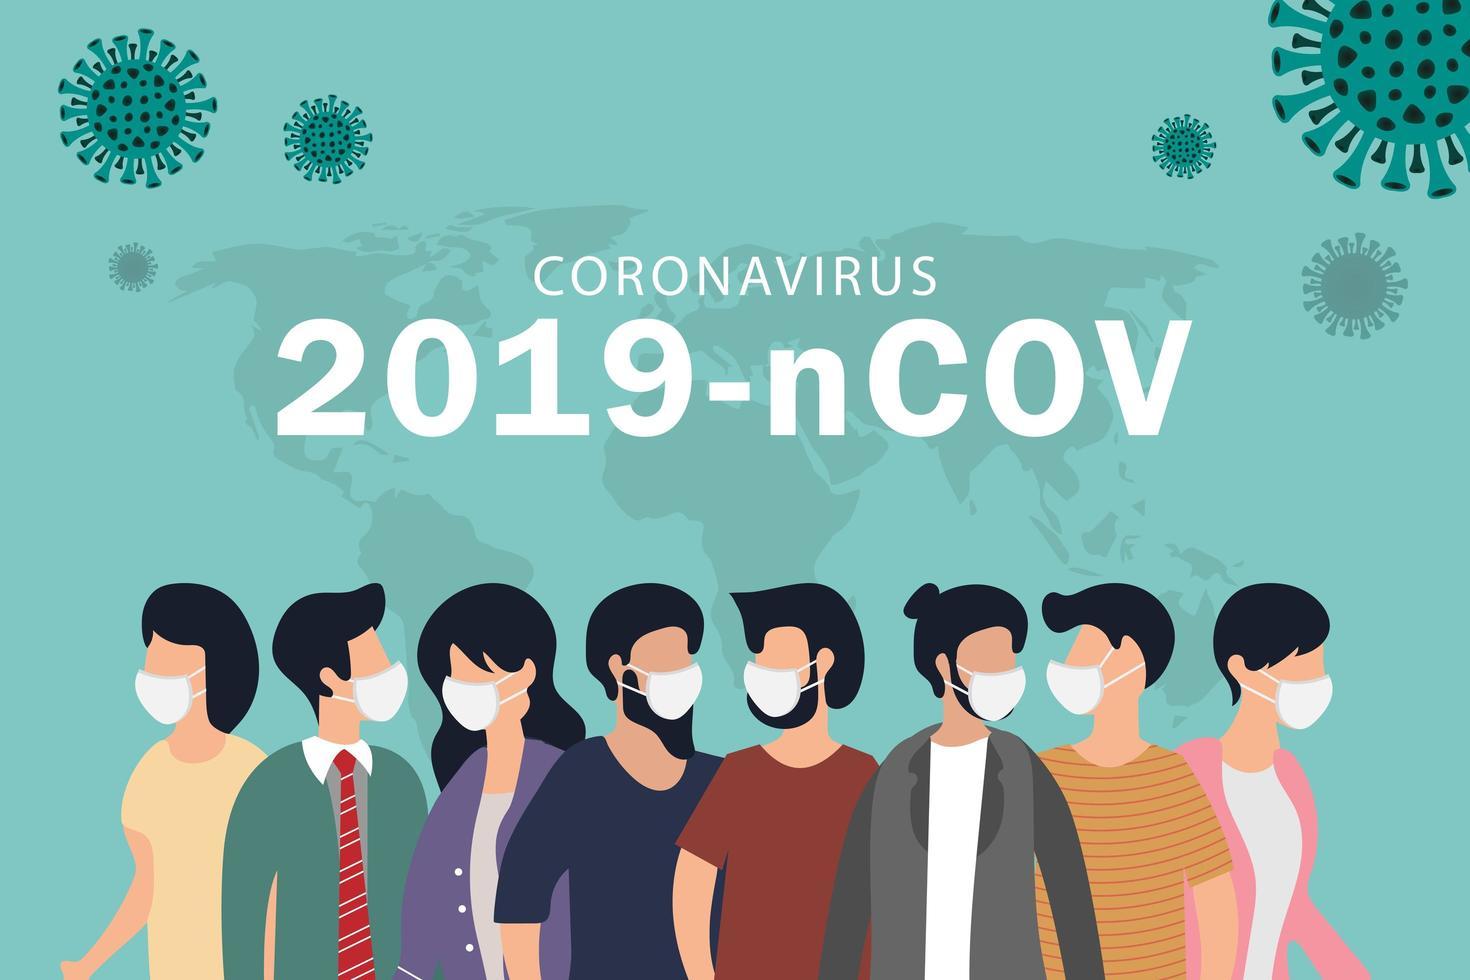 Coronavirus quarantine map with people in masks vector